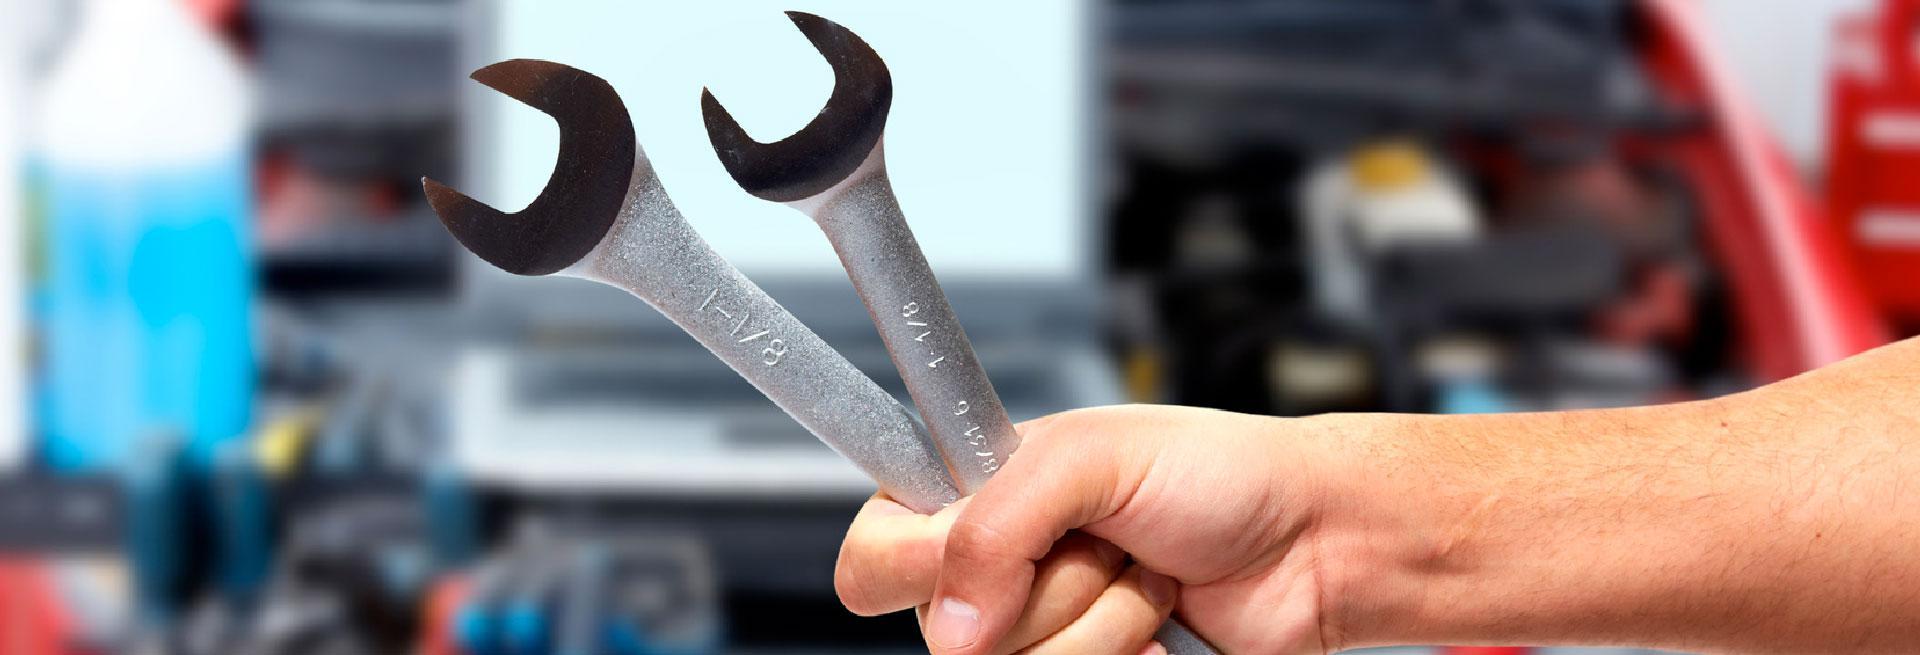 rechange auto service